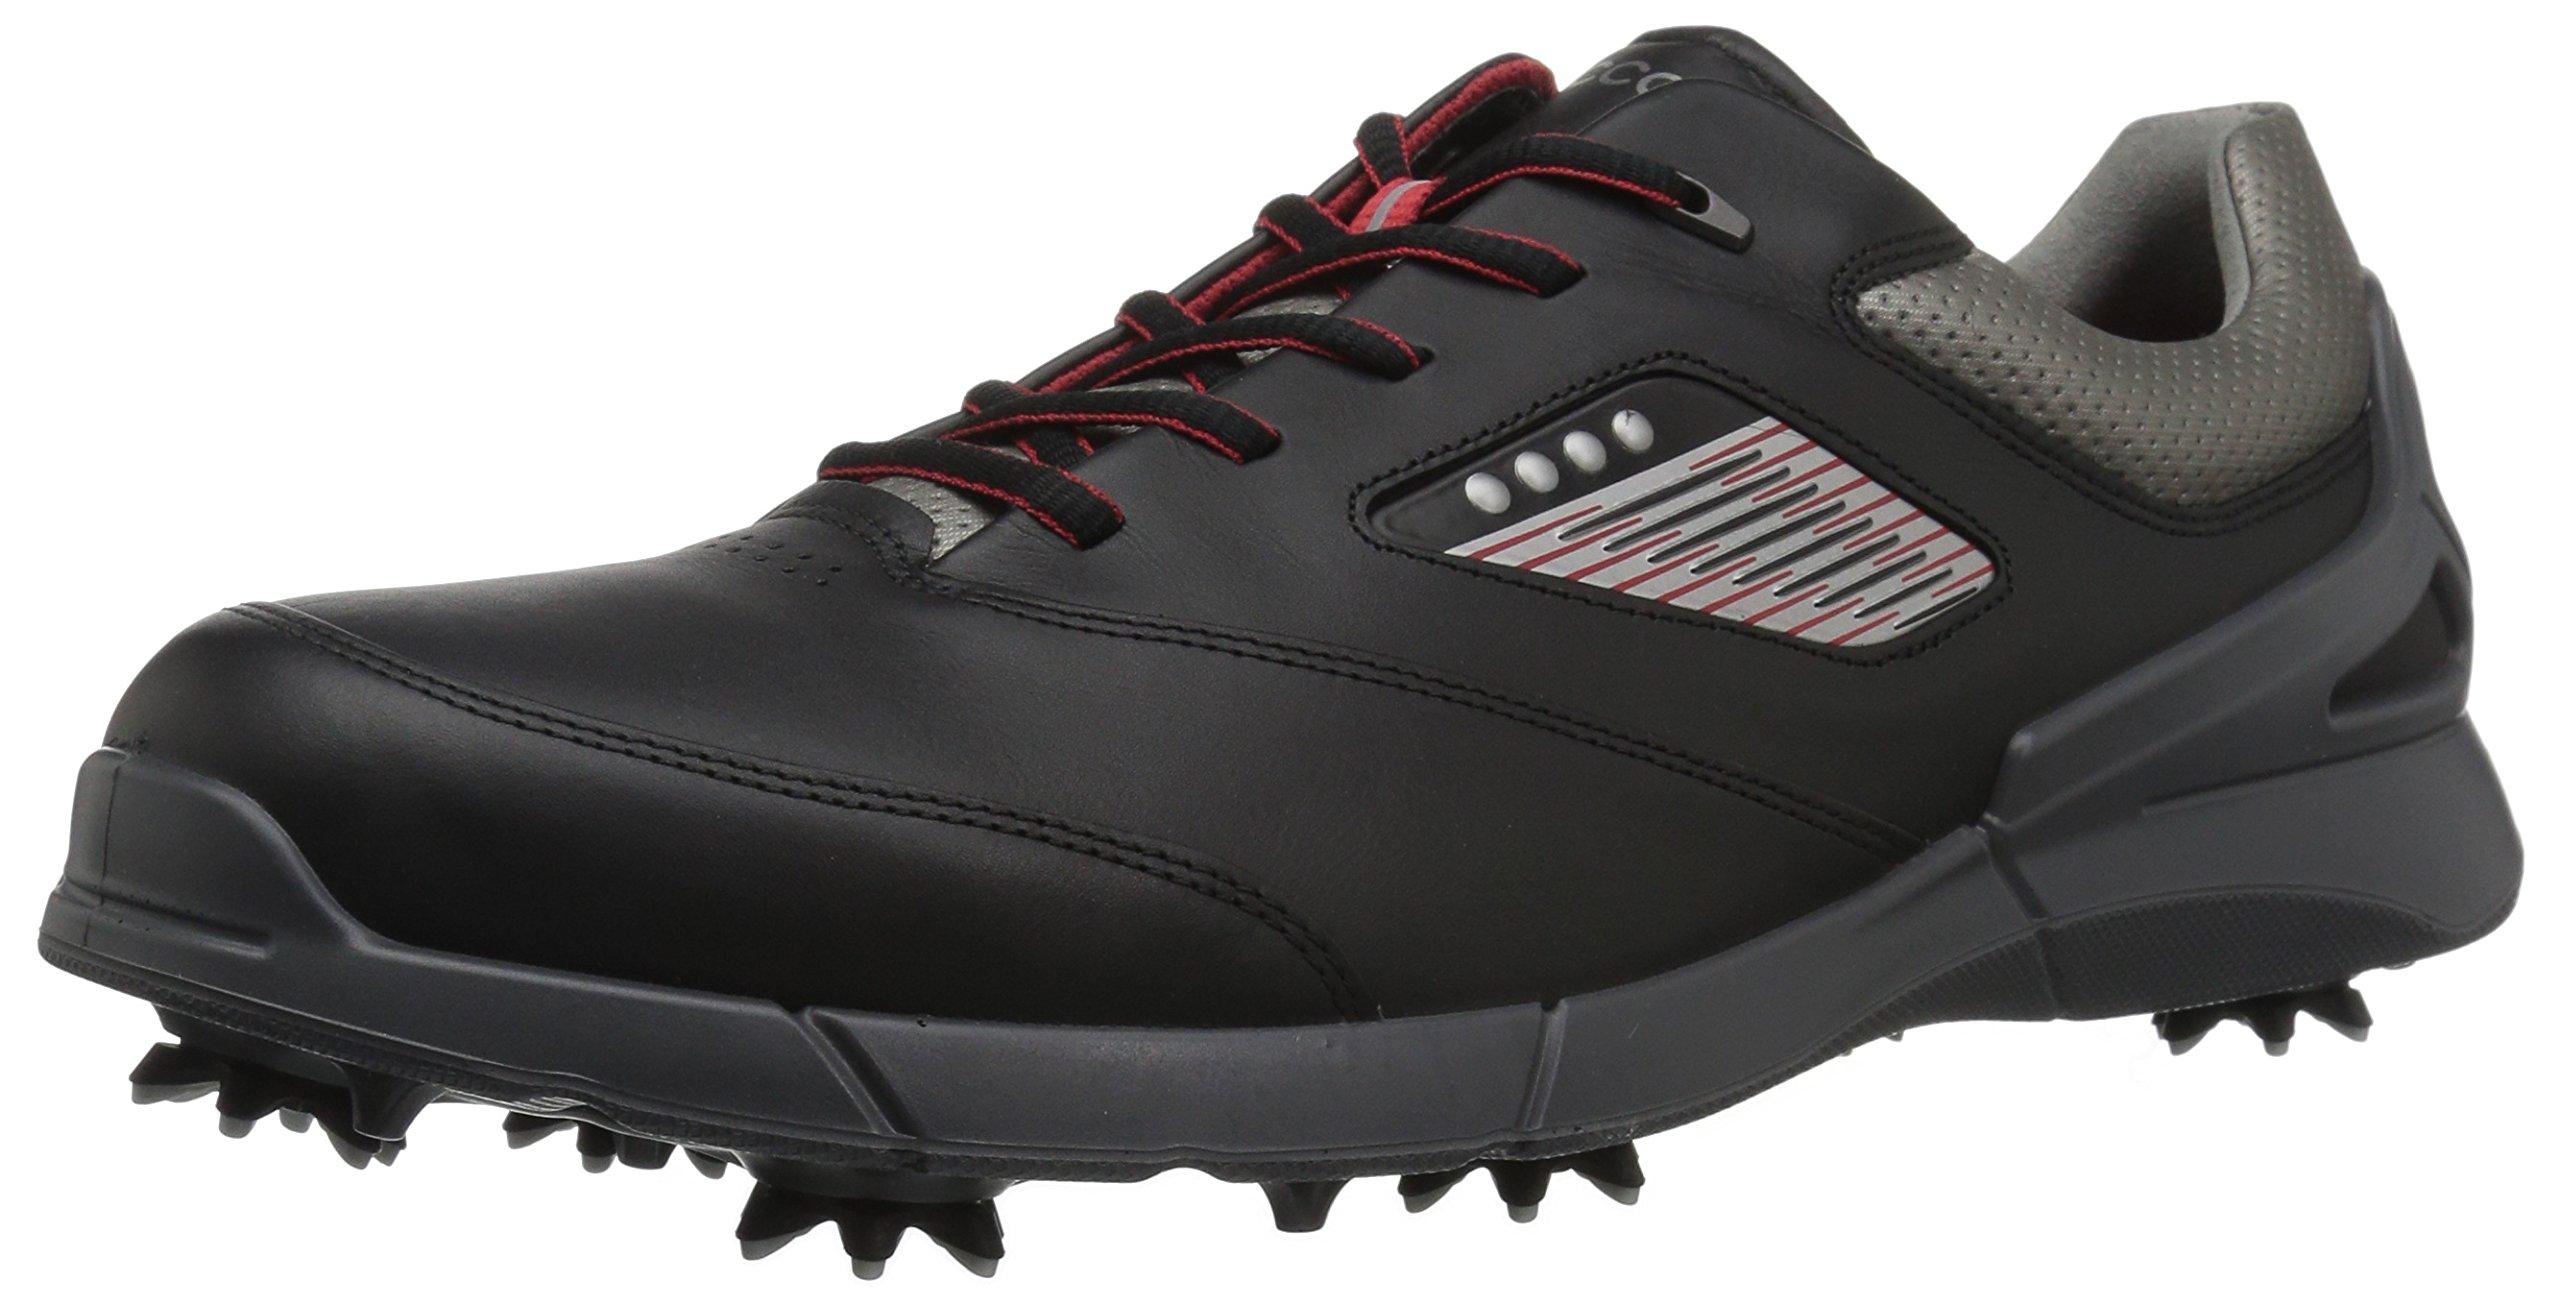 ECCO Men's Base One Golf Shoe, Black/Steel Hydromax, 47 EU/13-13.5 M US